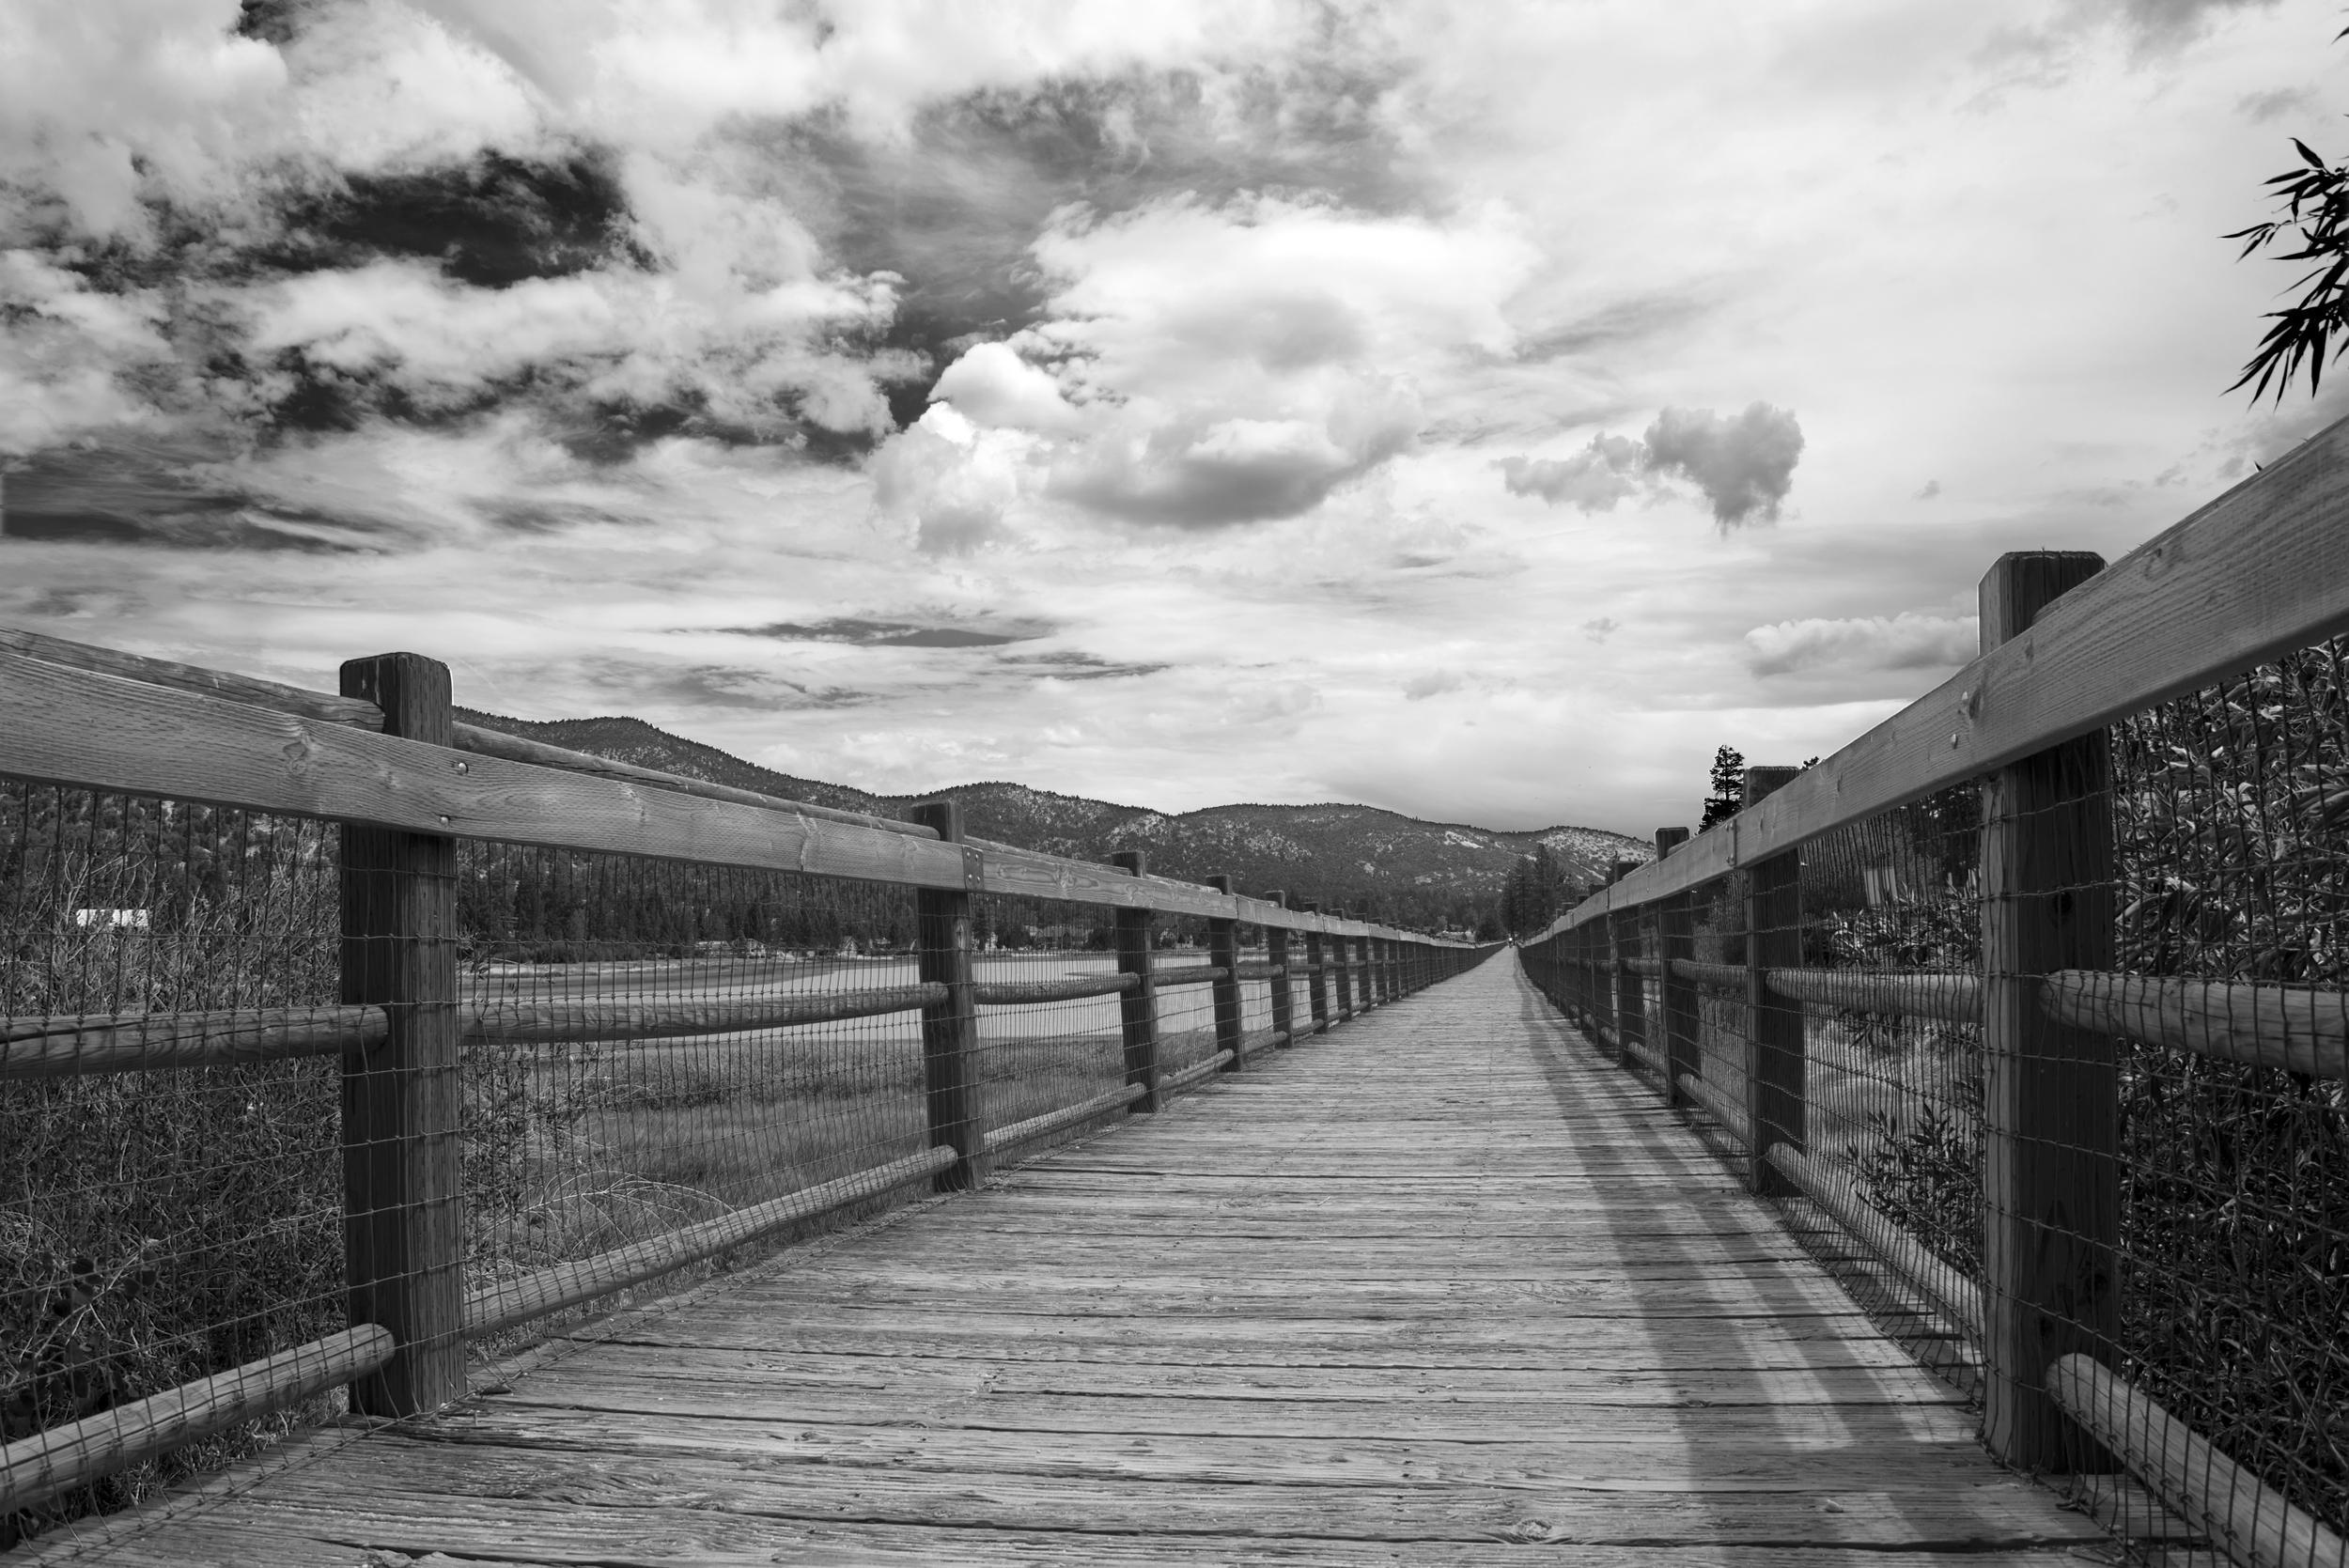 Big Bear_Bridge Scenery_Low Perspective_B&W.jpg